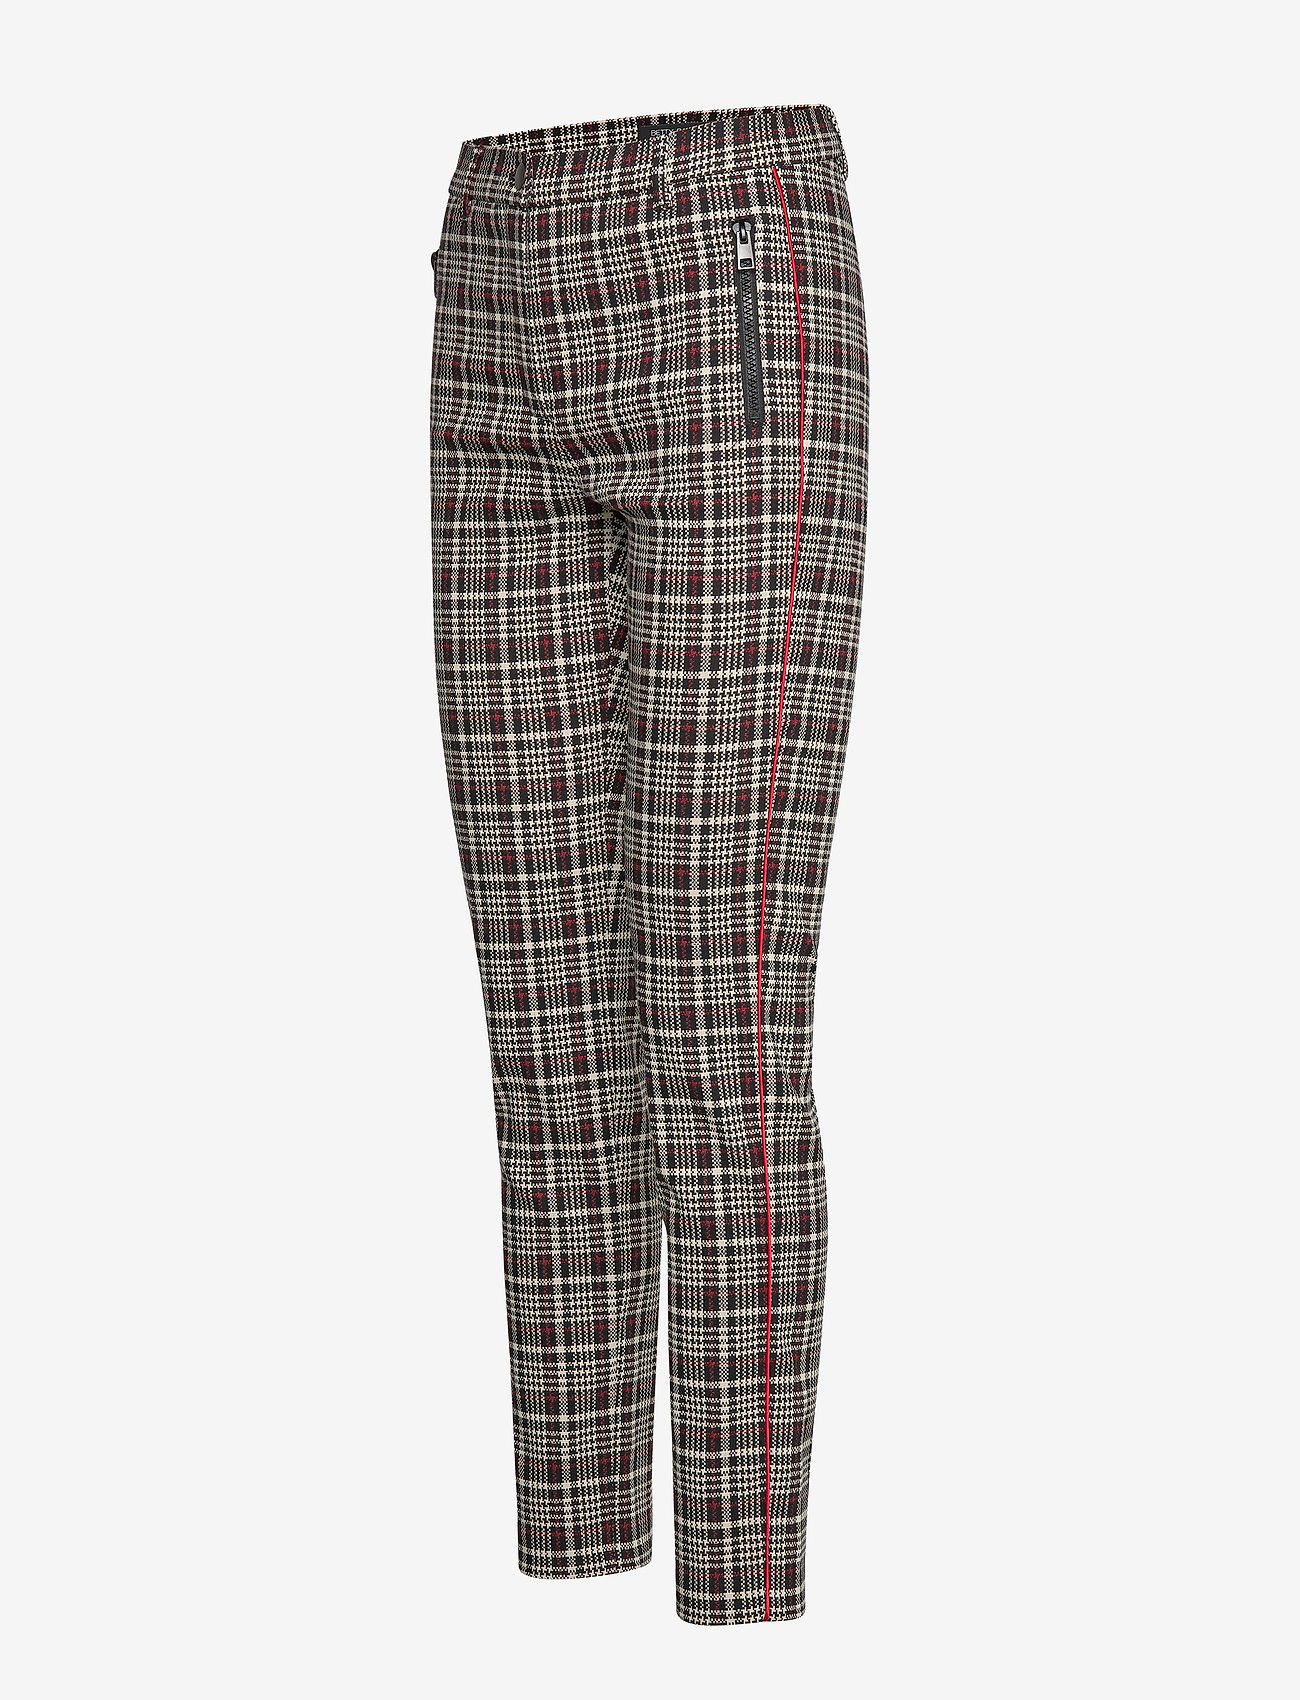 Pants Classic 1/1 Length (Black/cream) (519.60 kr) - Betty Barclay